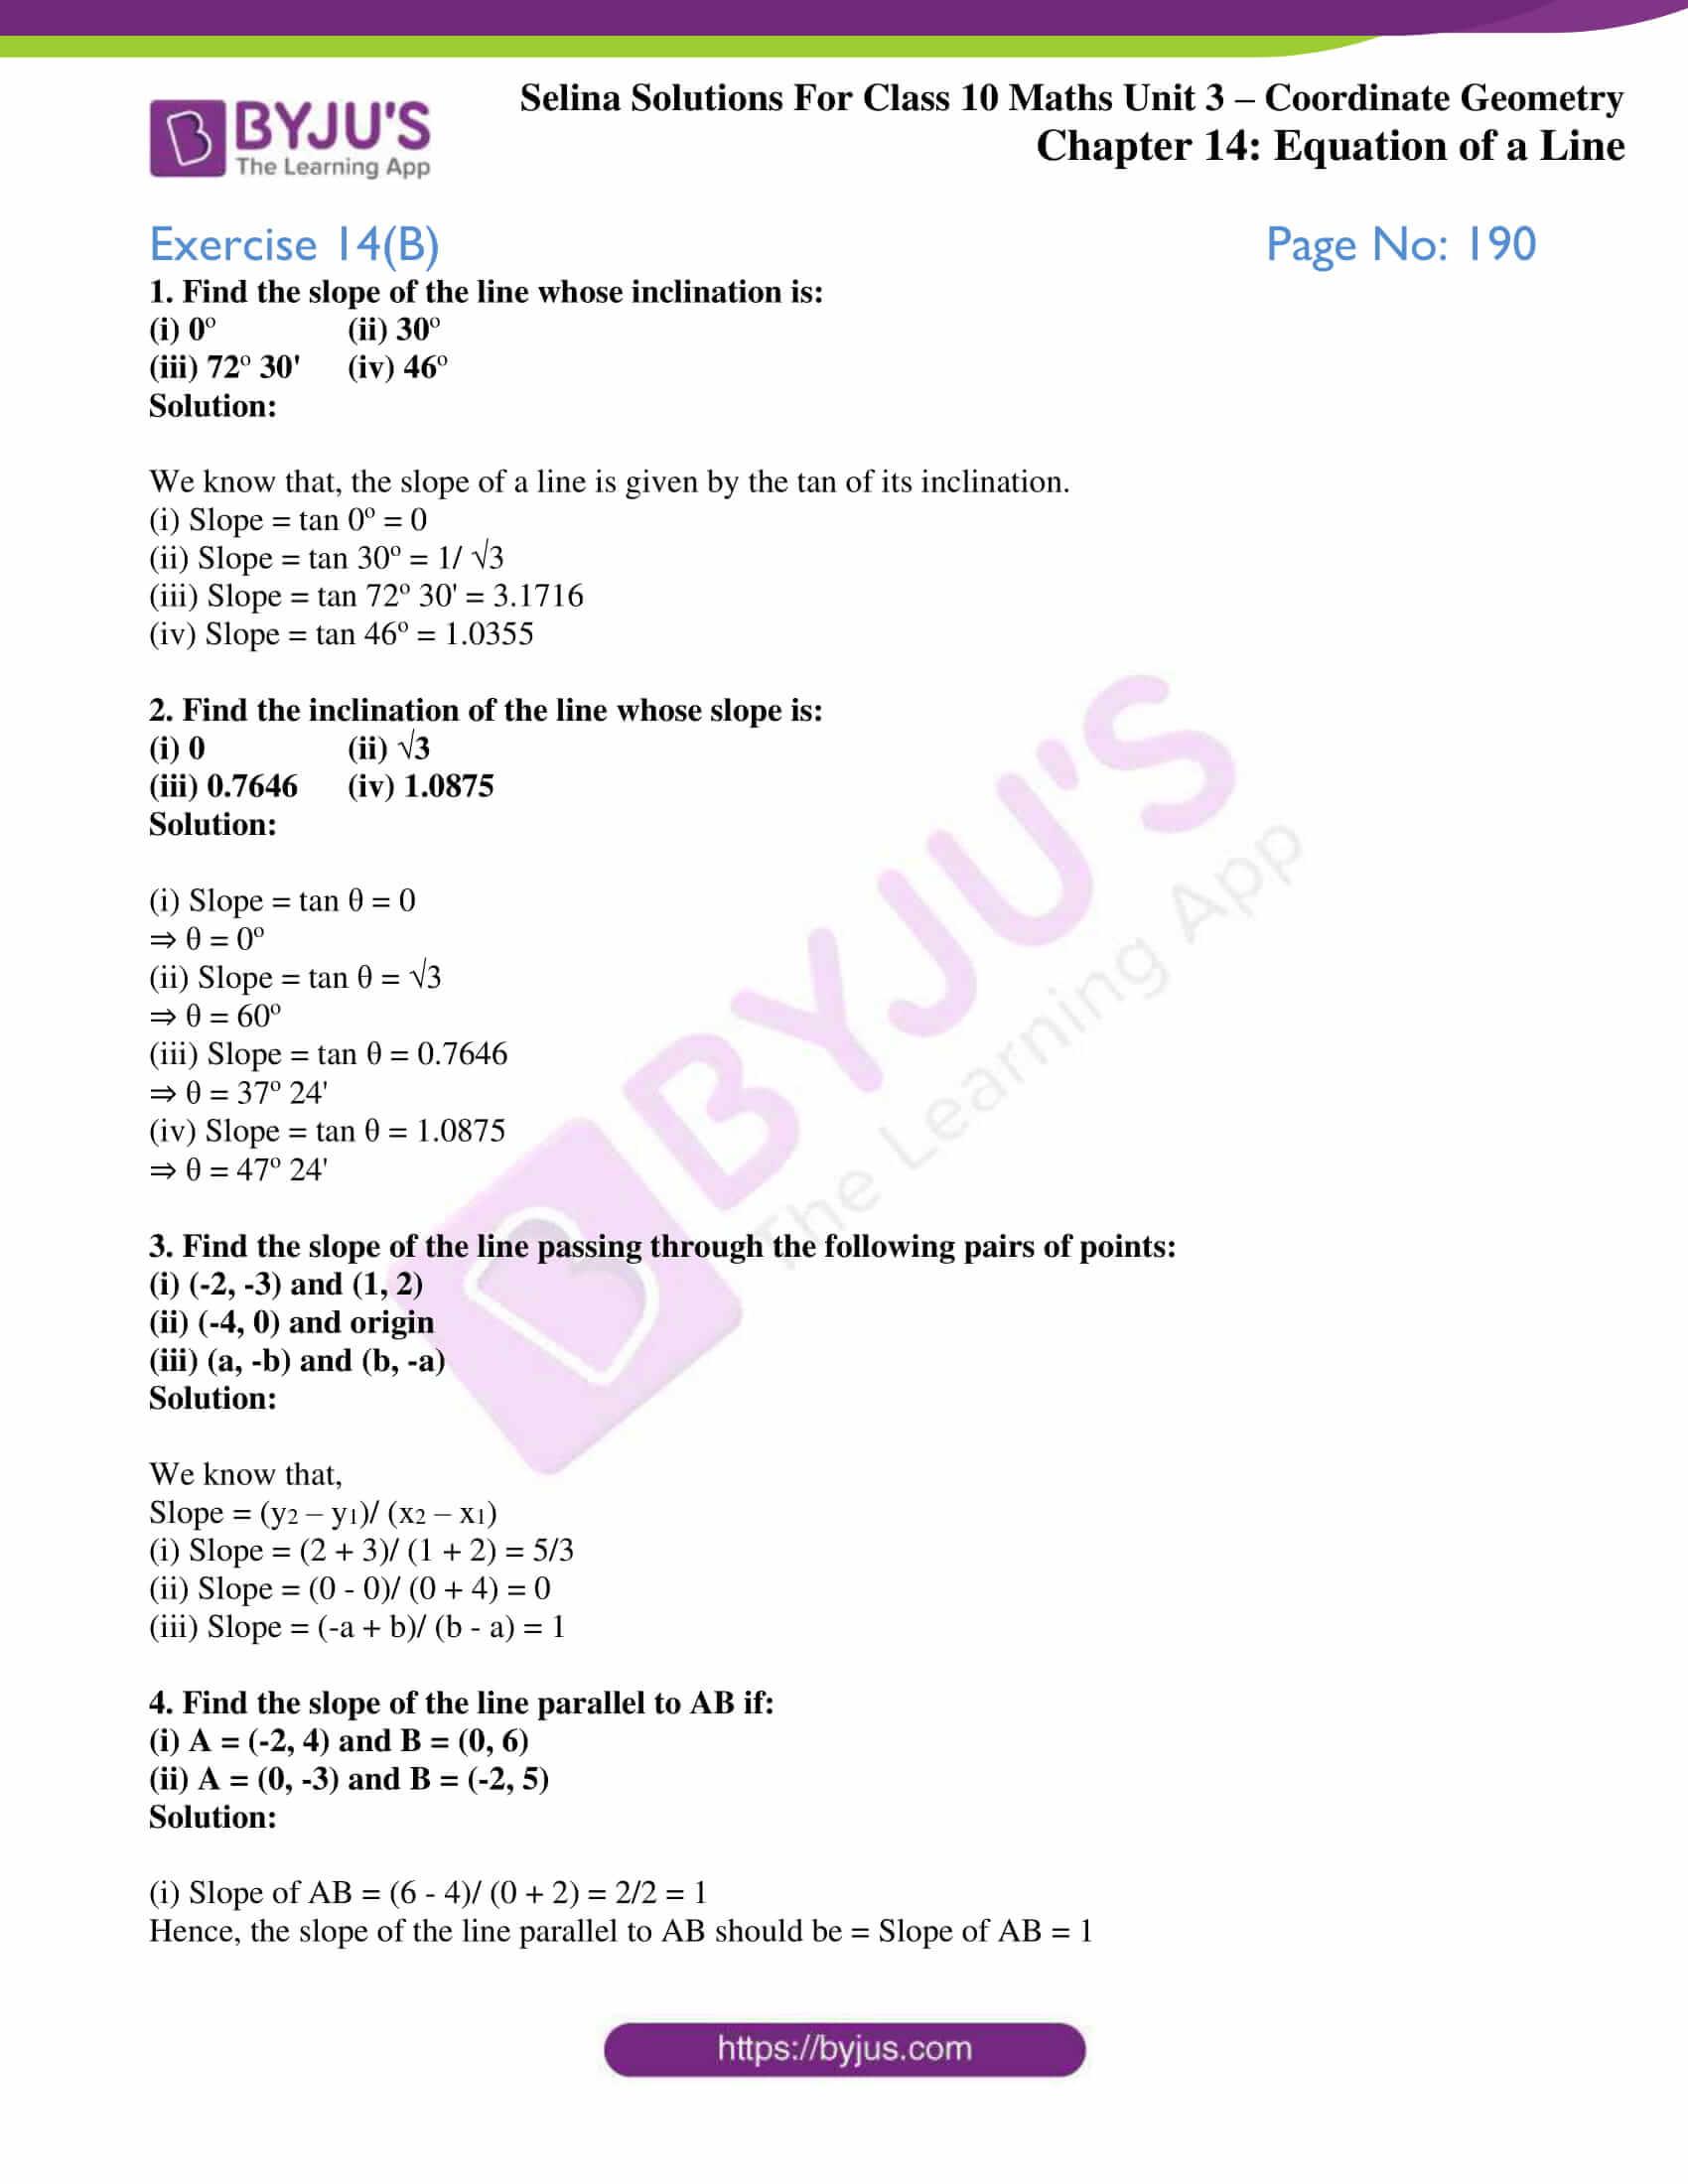 selina-sol-maths-class-10-ch-14-ex-b-1